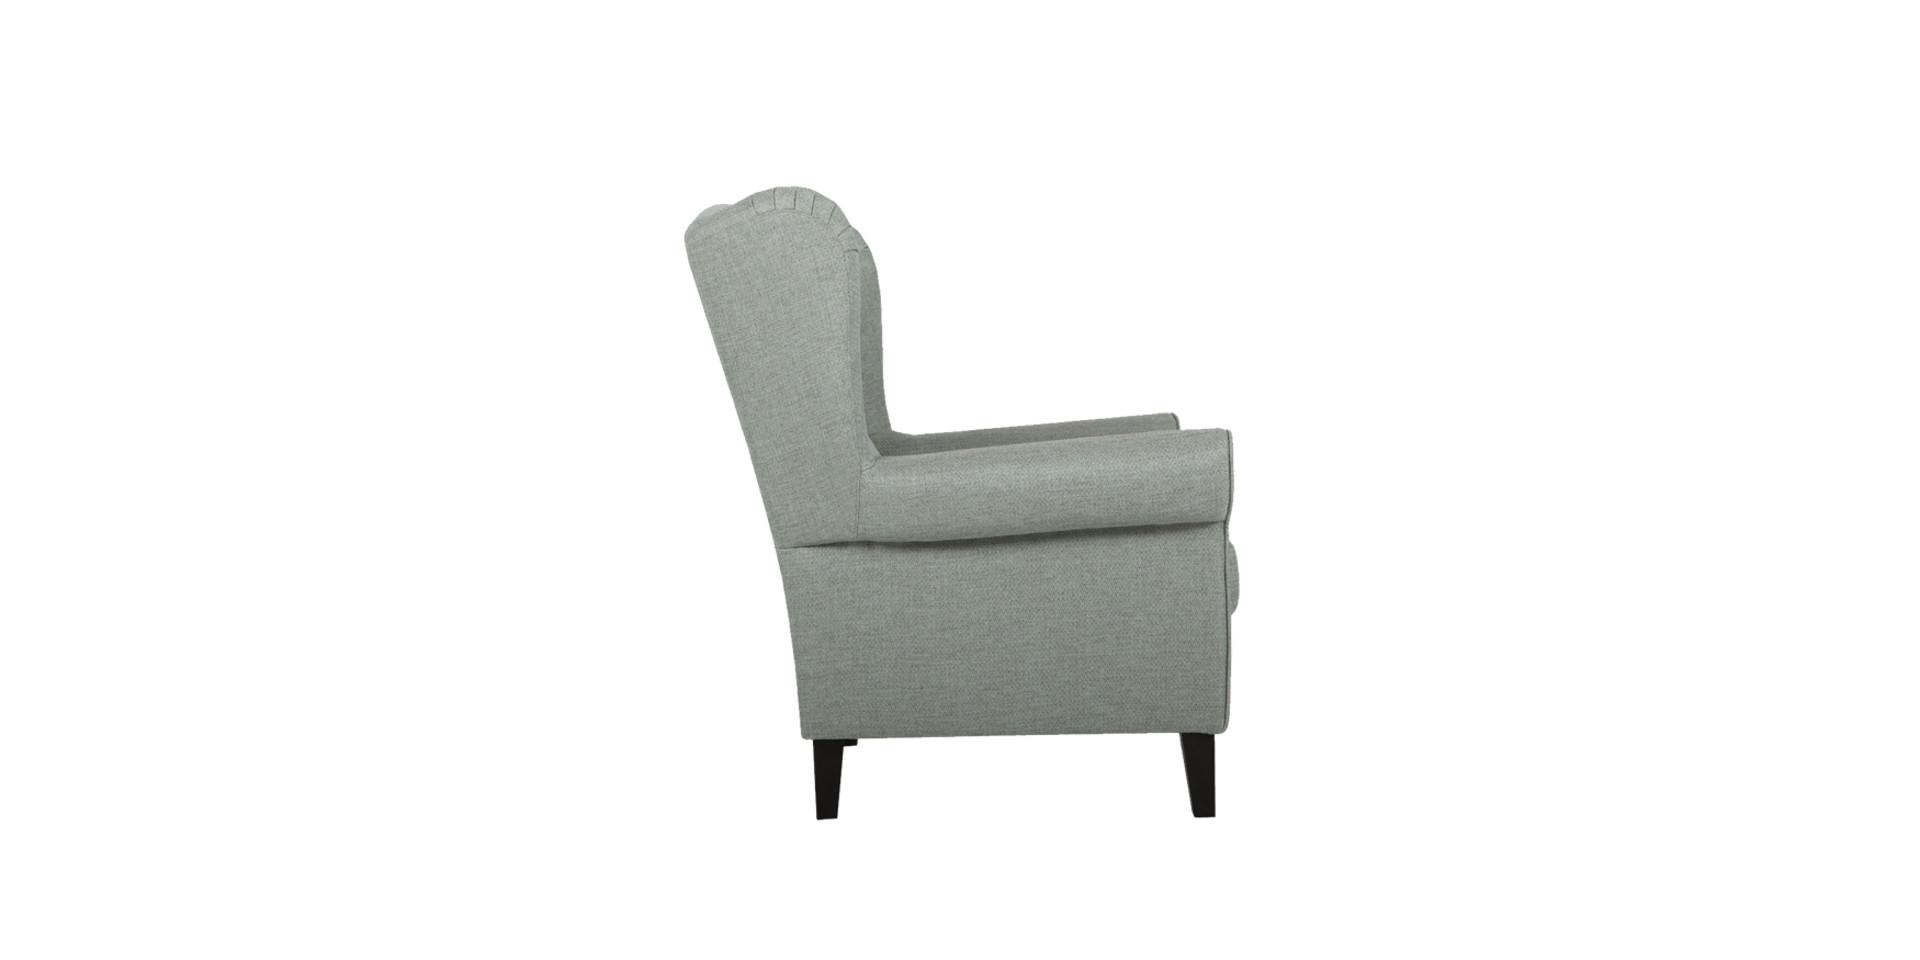 sits-watson-fauteuil-armchair_himalaya7_green_3